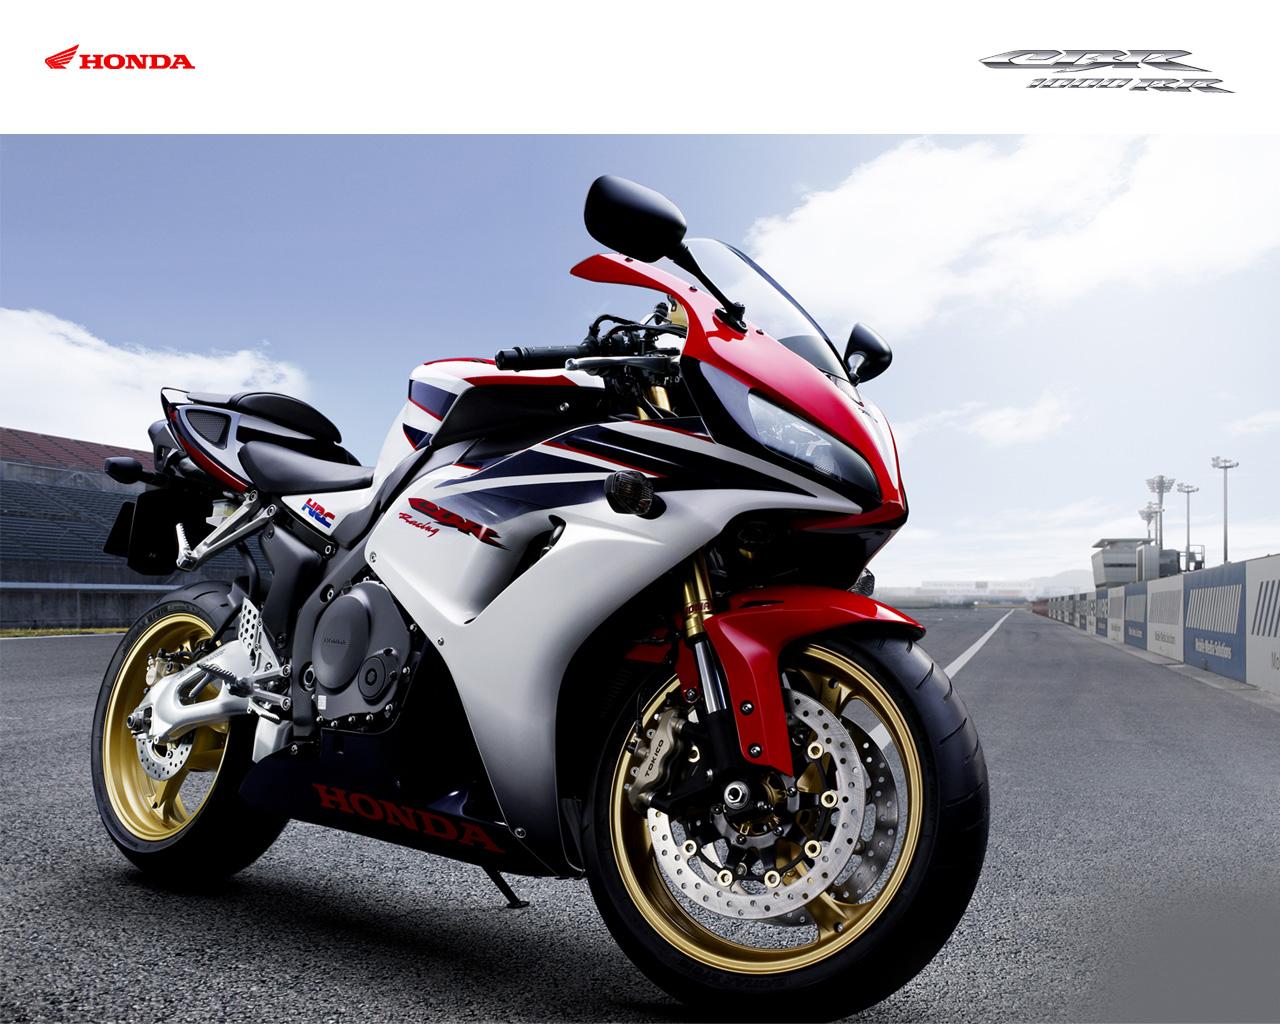 Honda Fireblade Hintergrundbilder F 252 R Deinen Pc Der Cbr1000rr Sc57